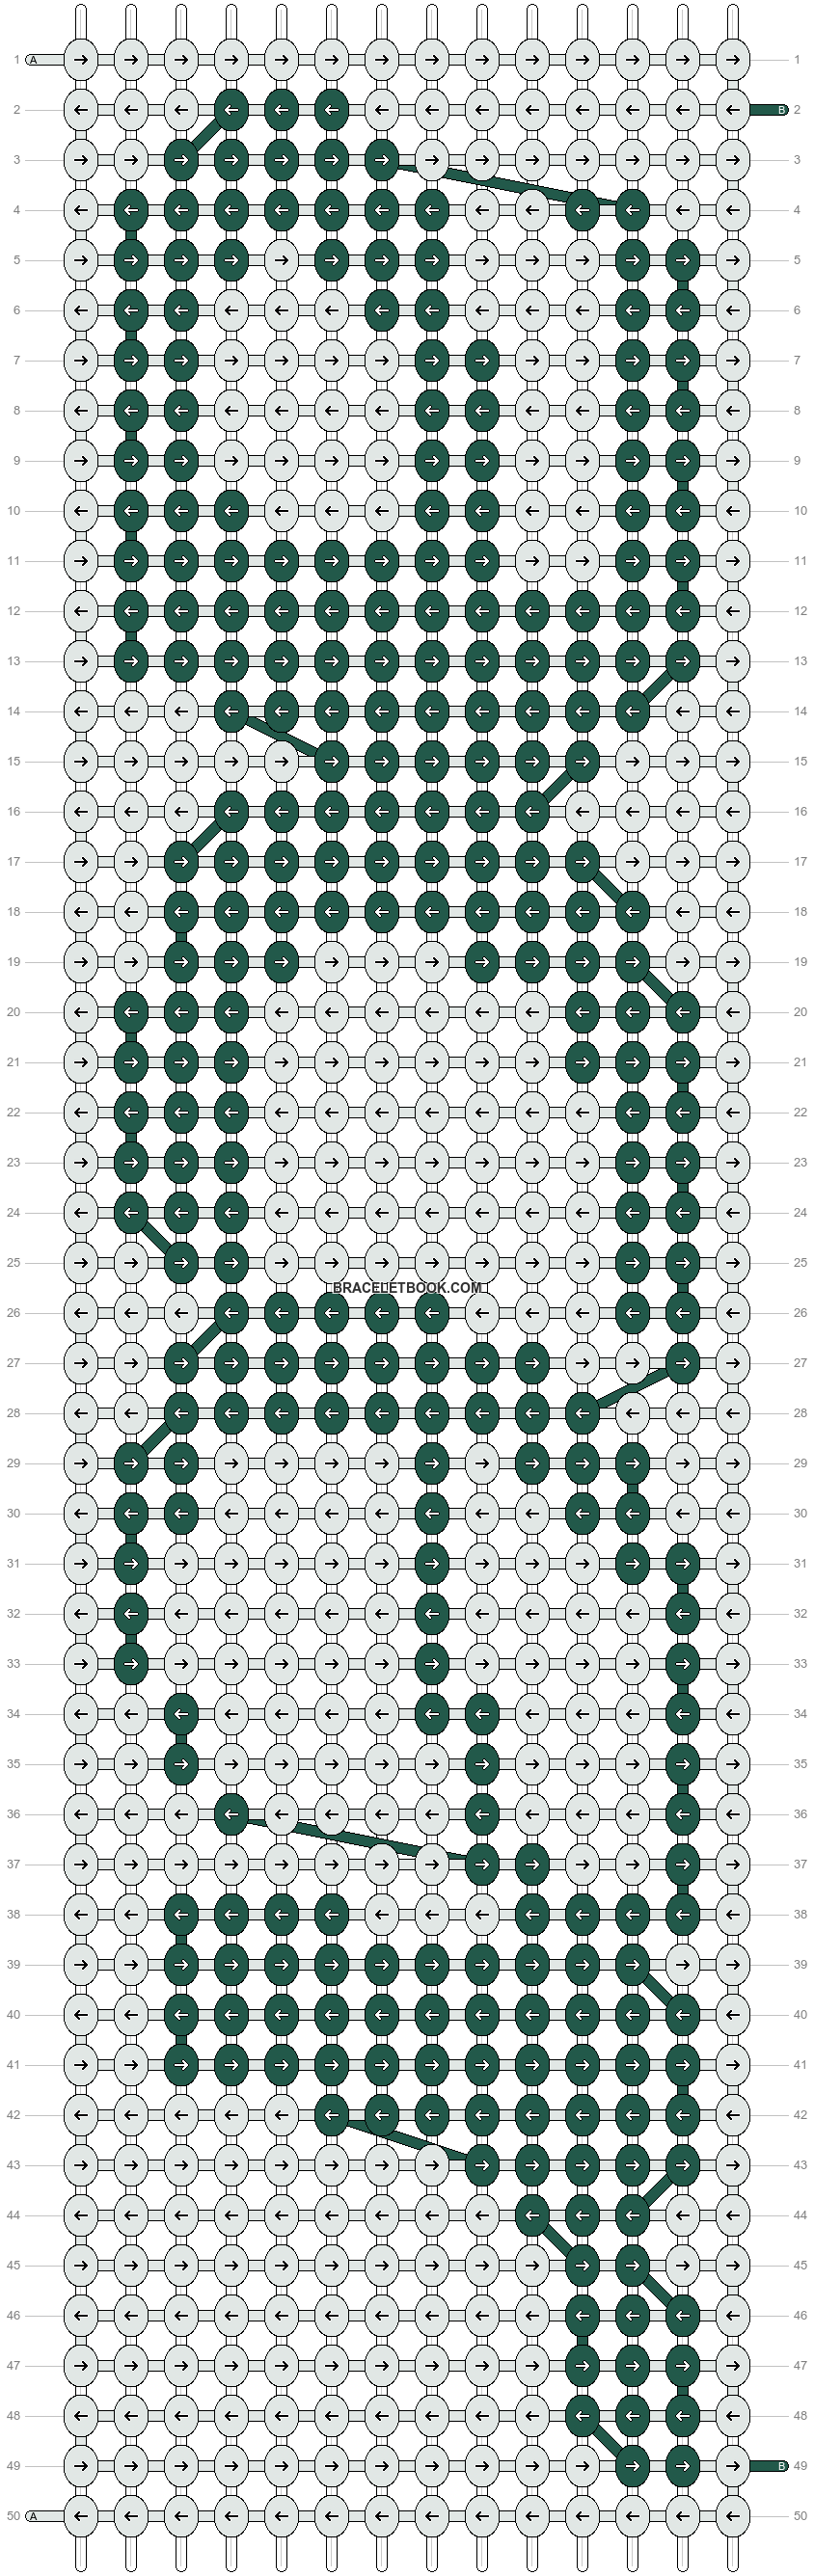 Alpha pattern #661 pattern